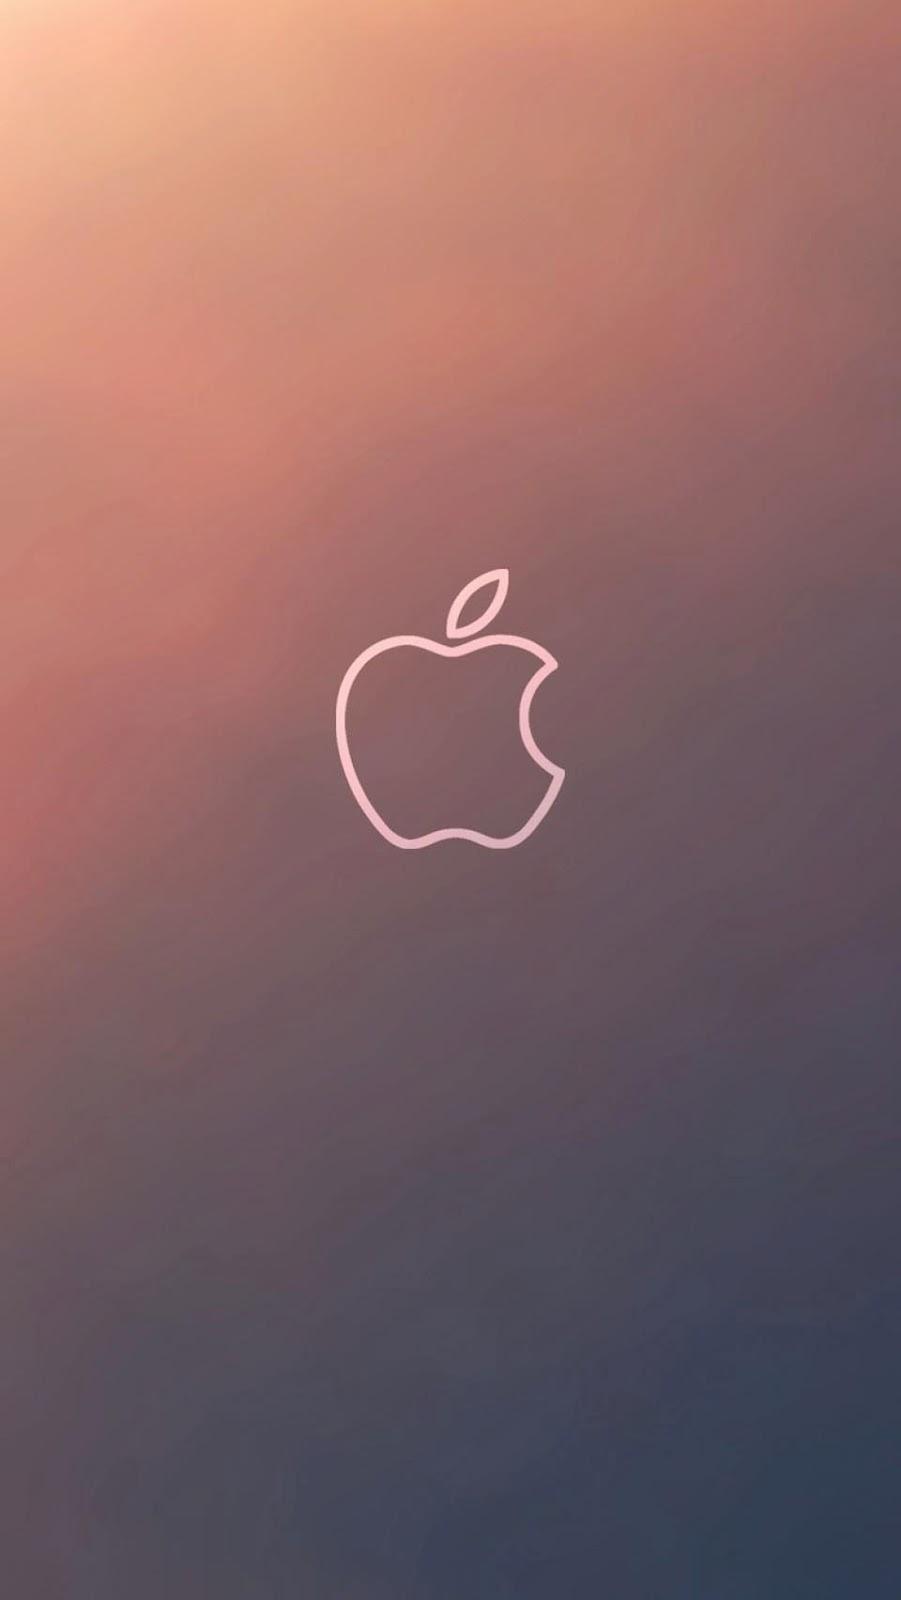 49 Apple Wallpaper For Iphone 6 On Wallpapersafari